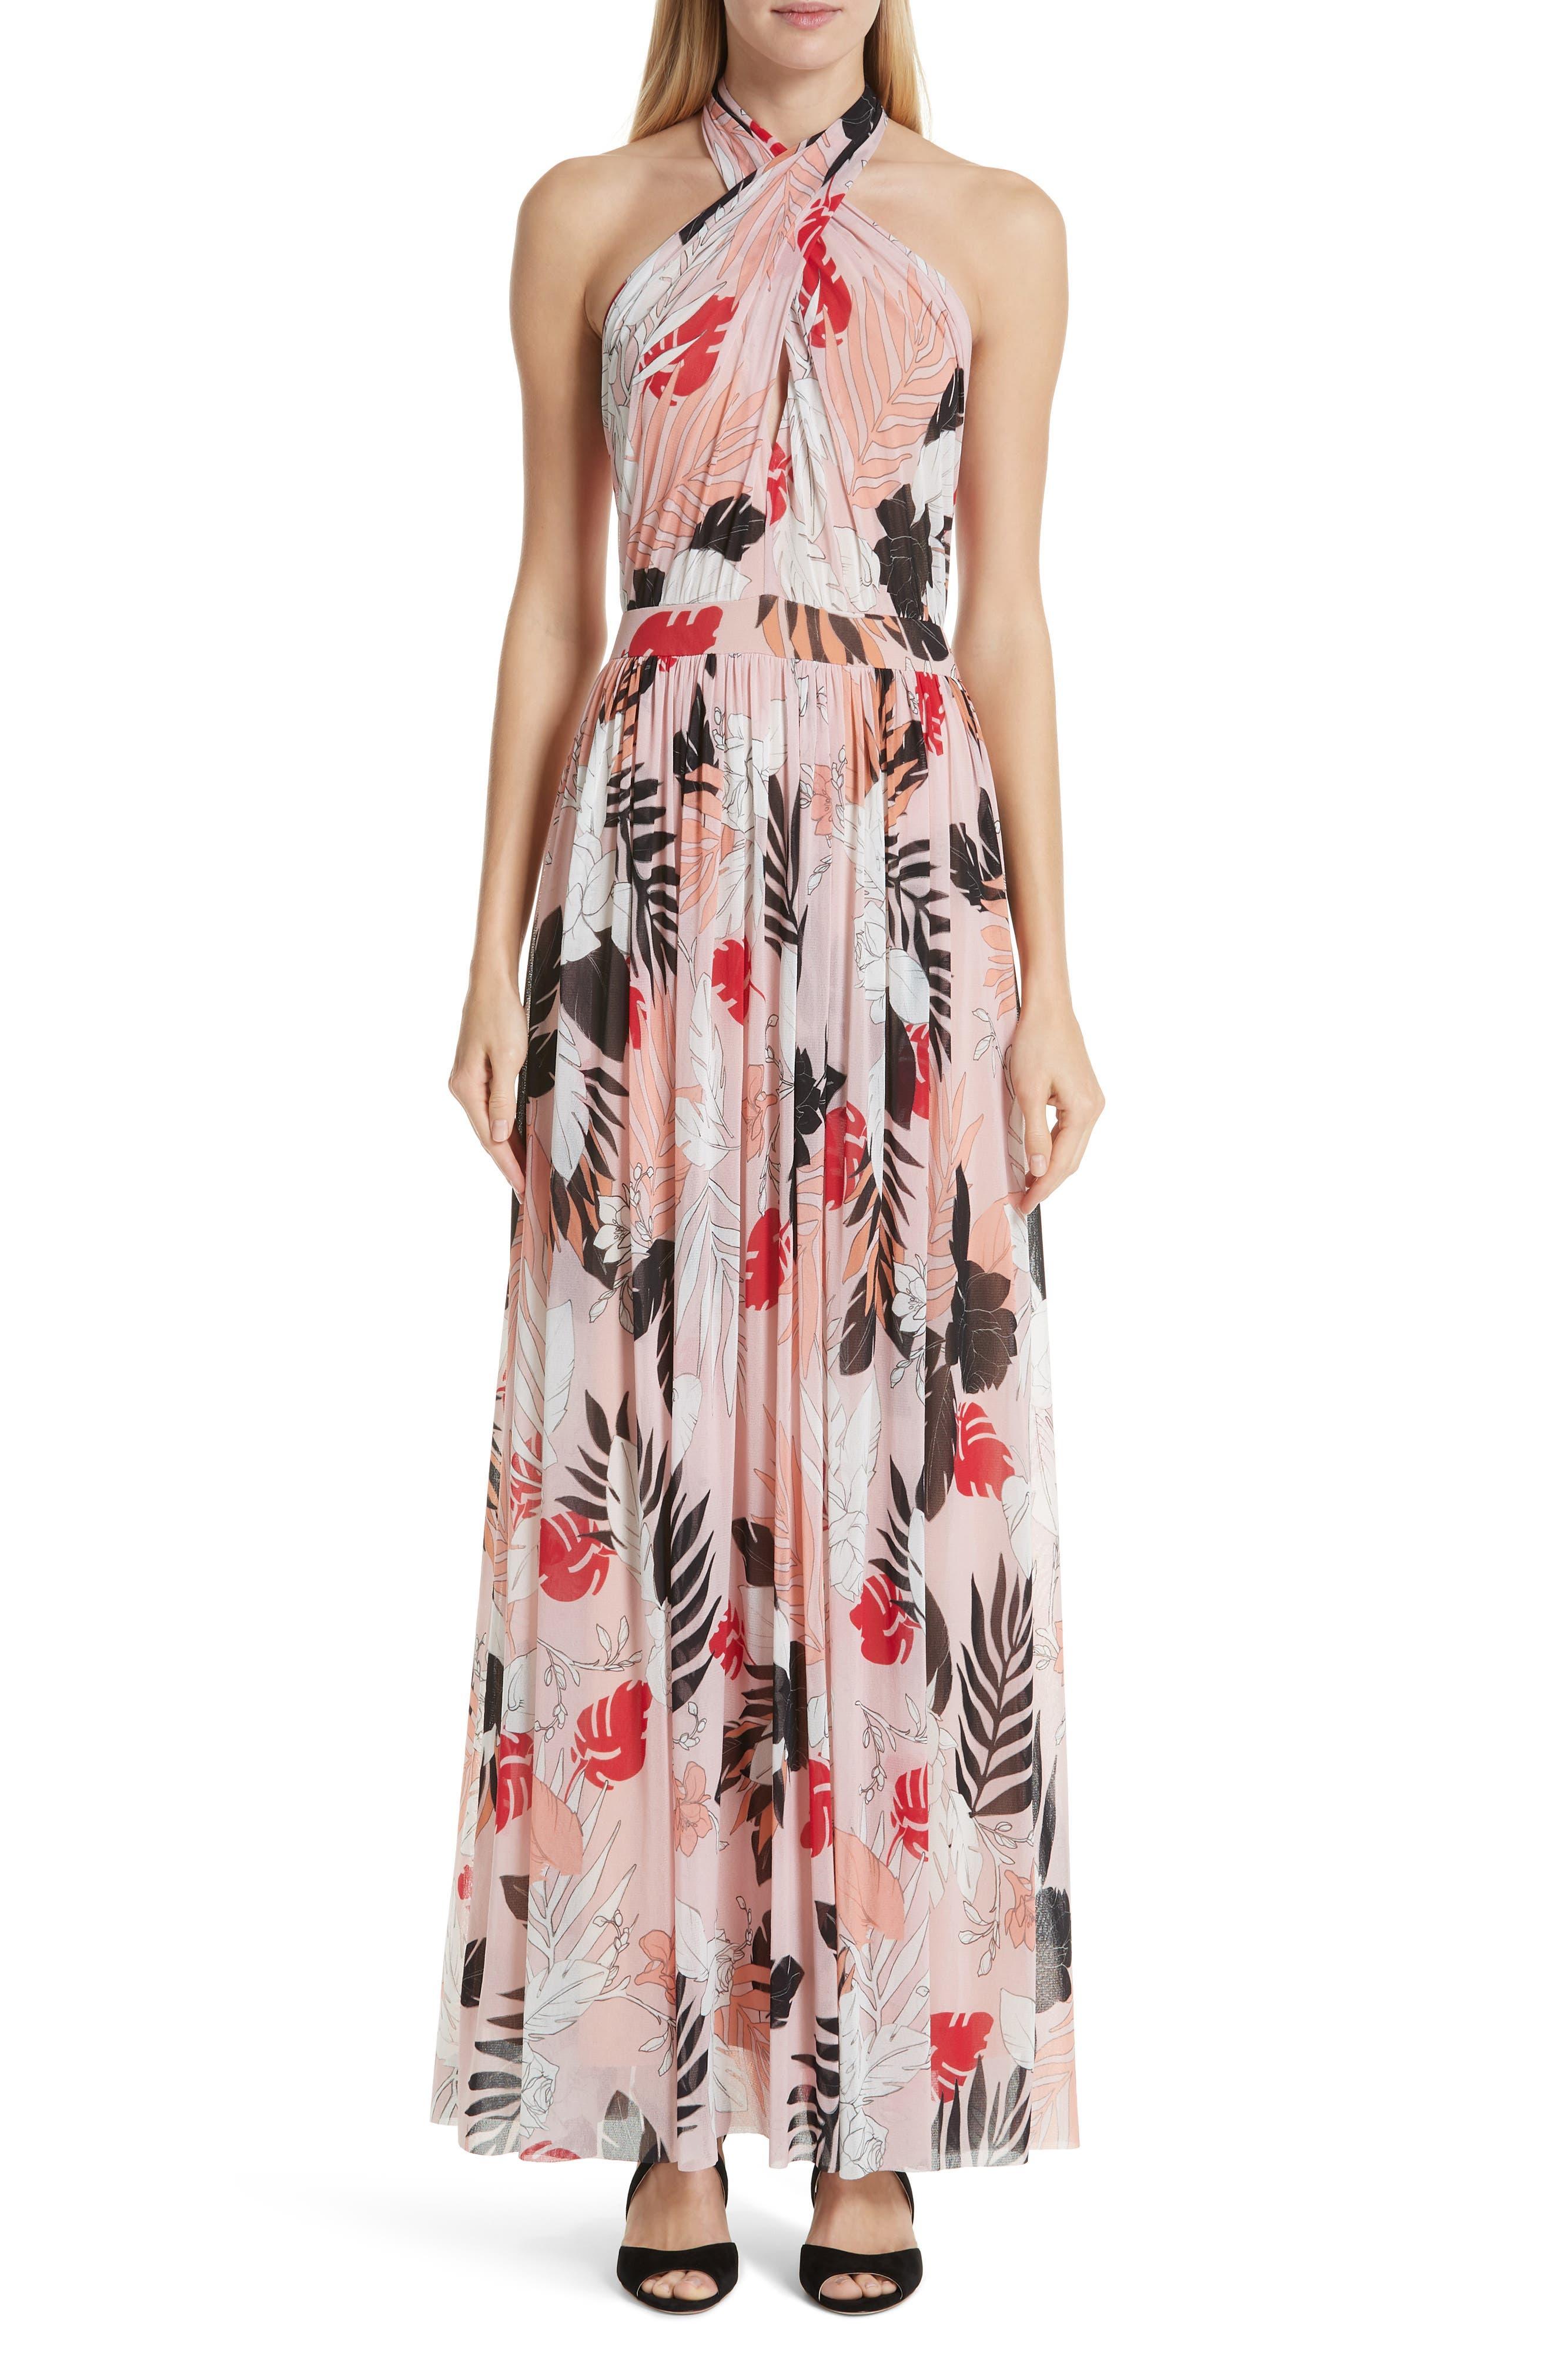 FUZZI, Floral Tulle Cross Halter Maxi Dress, Main thumbnail 1, color, ALBA